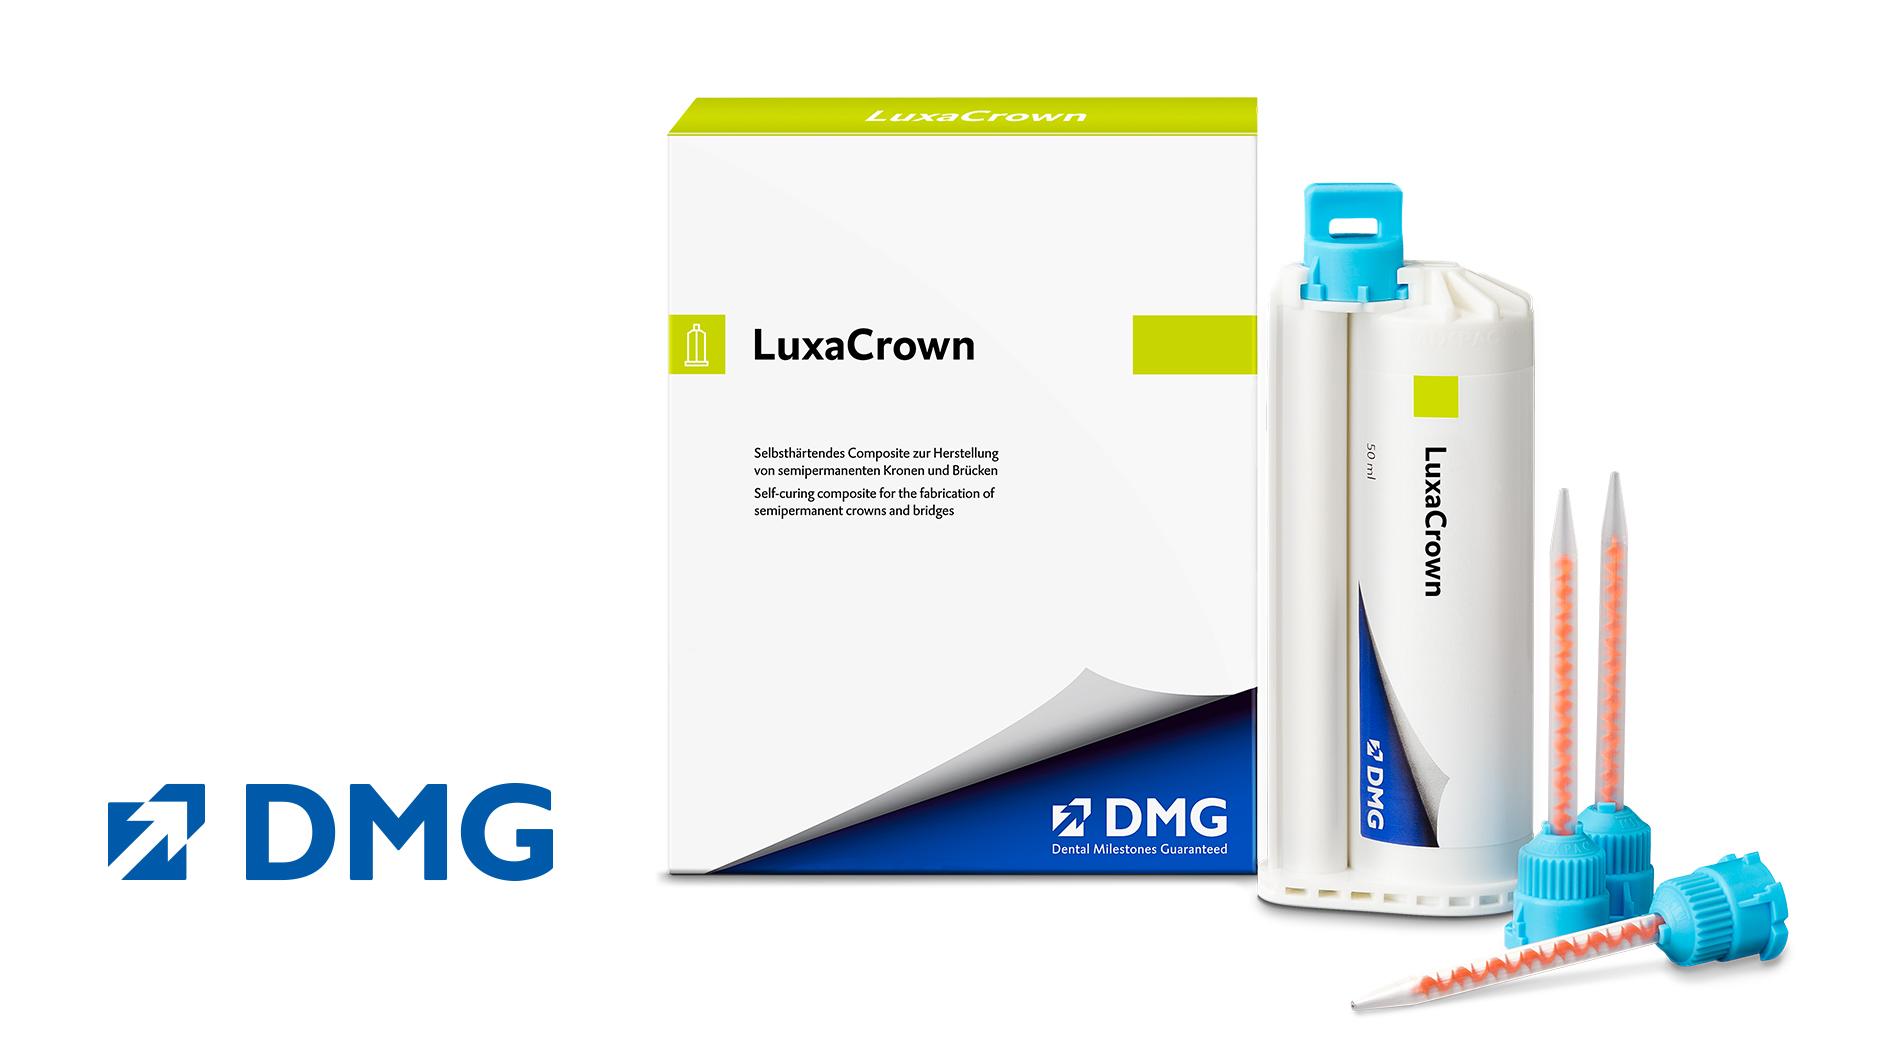 LuxaCrown DMG